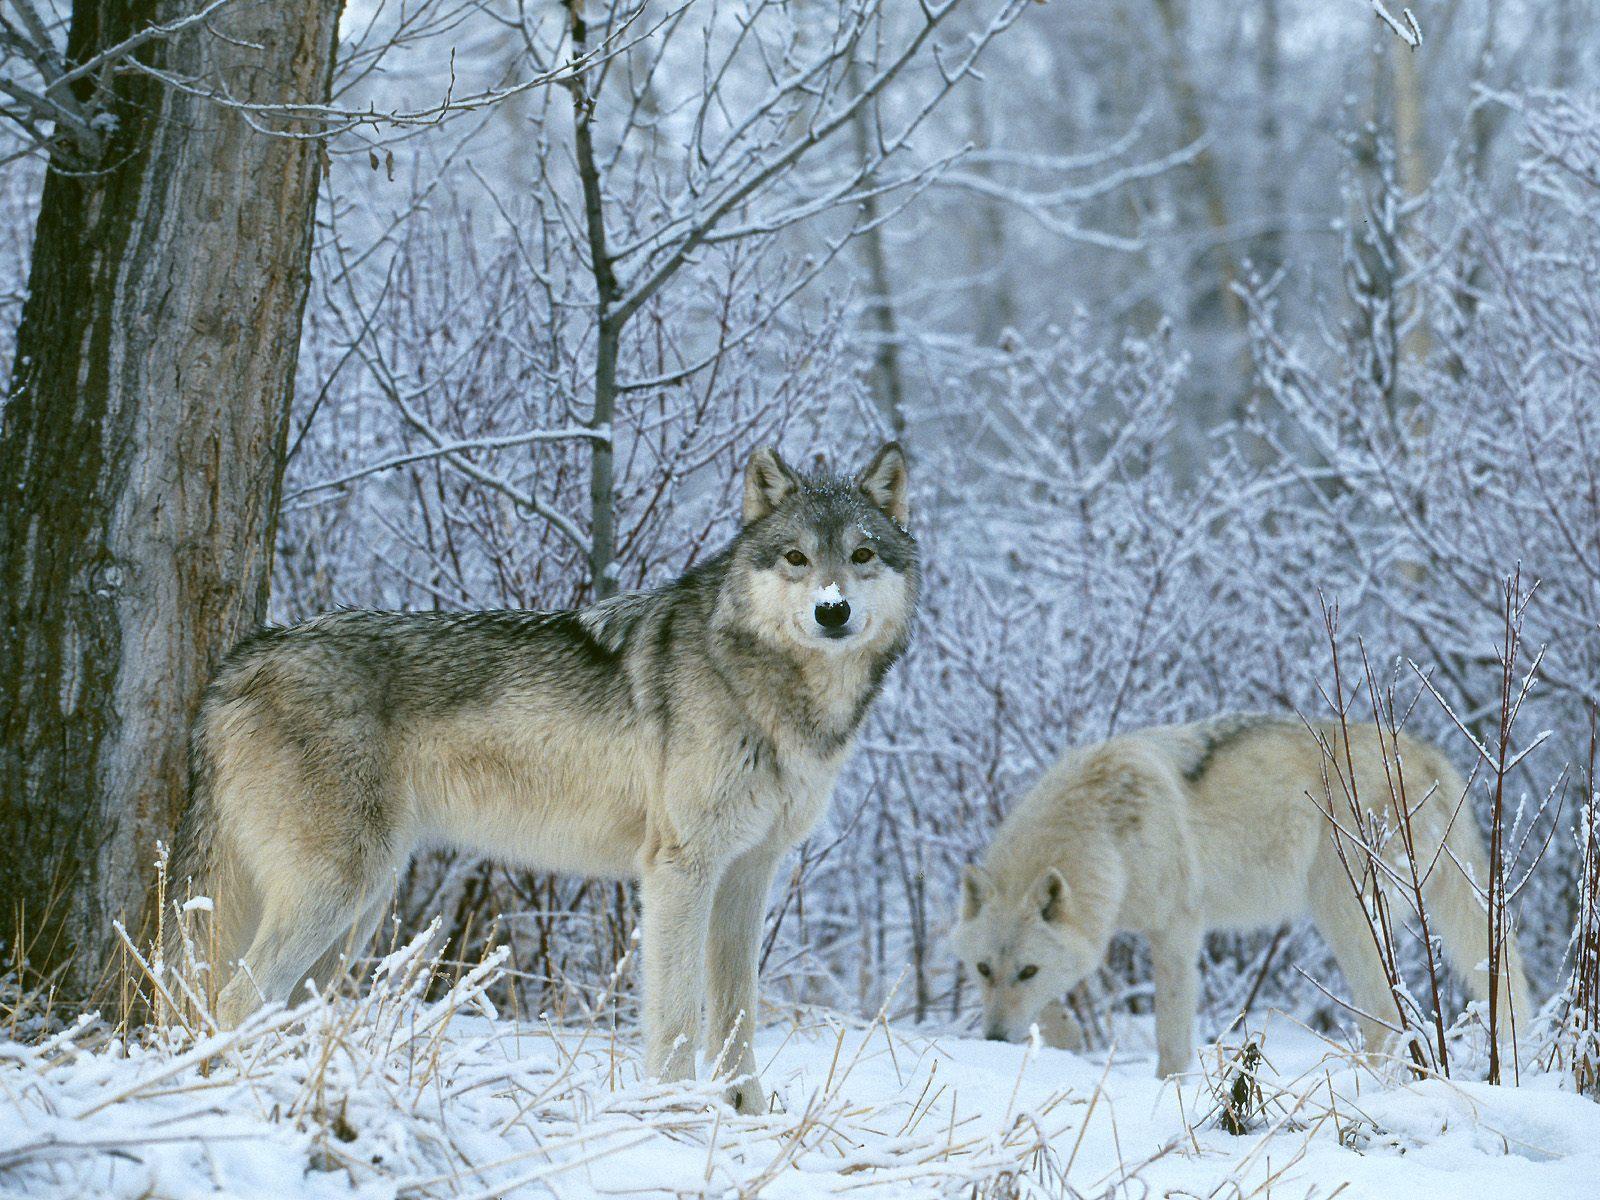 Top Wallpaper Horse Snow - gray-wolves-in-snow-beautiful-kewl  Photograph_605811.jpg